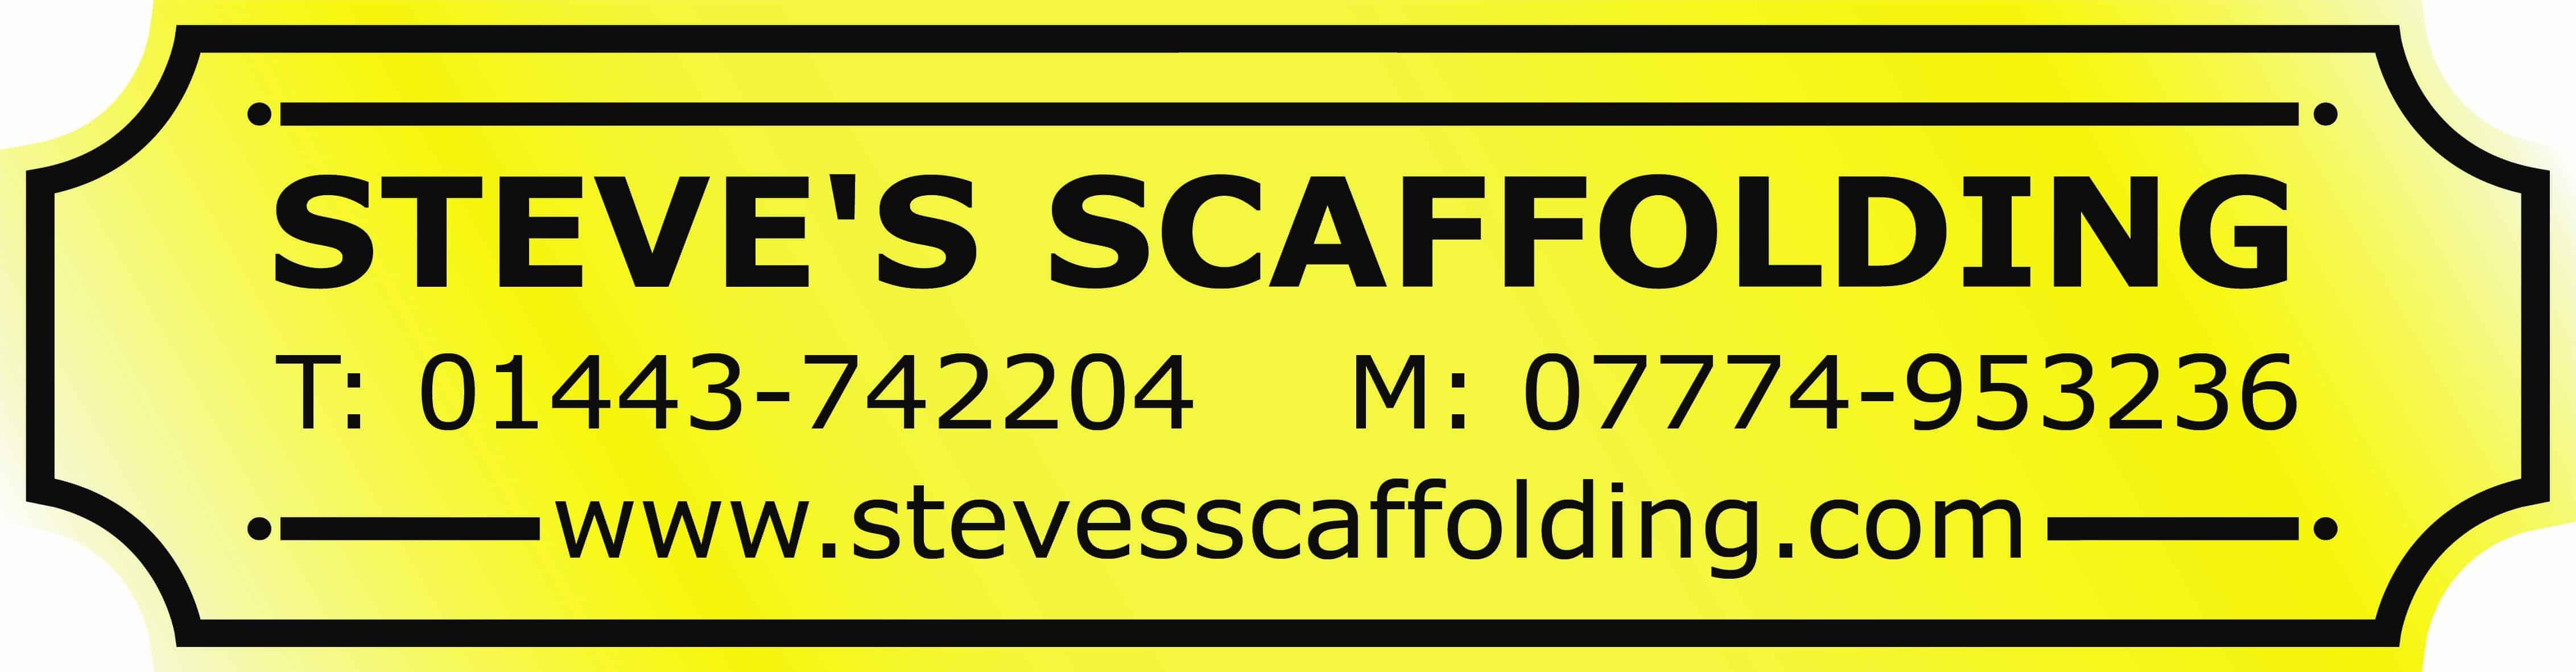 Scaffolding, Design & installation Service in Wales